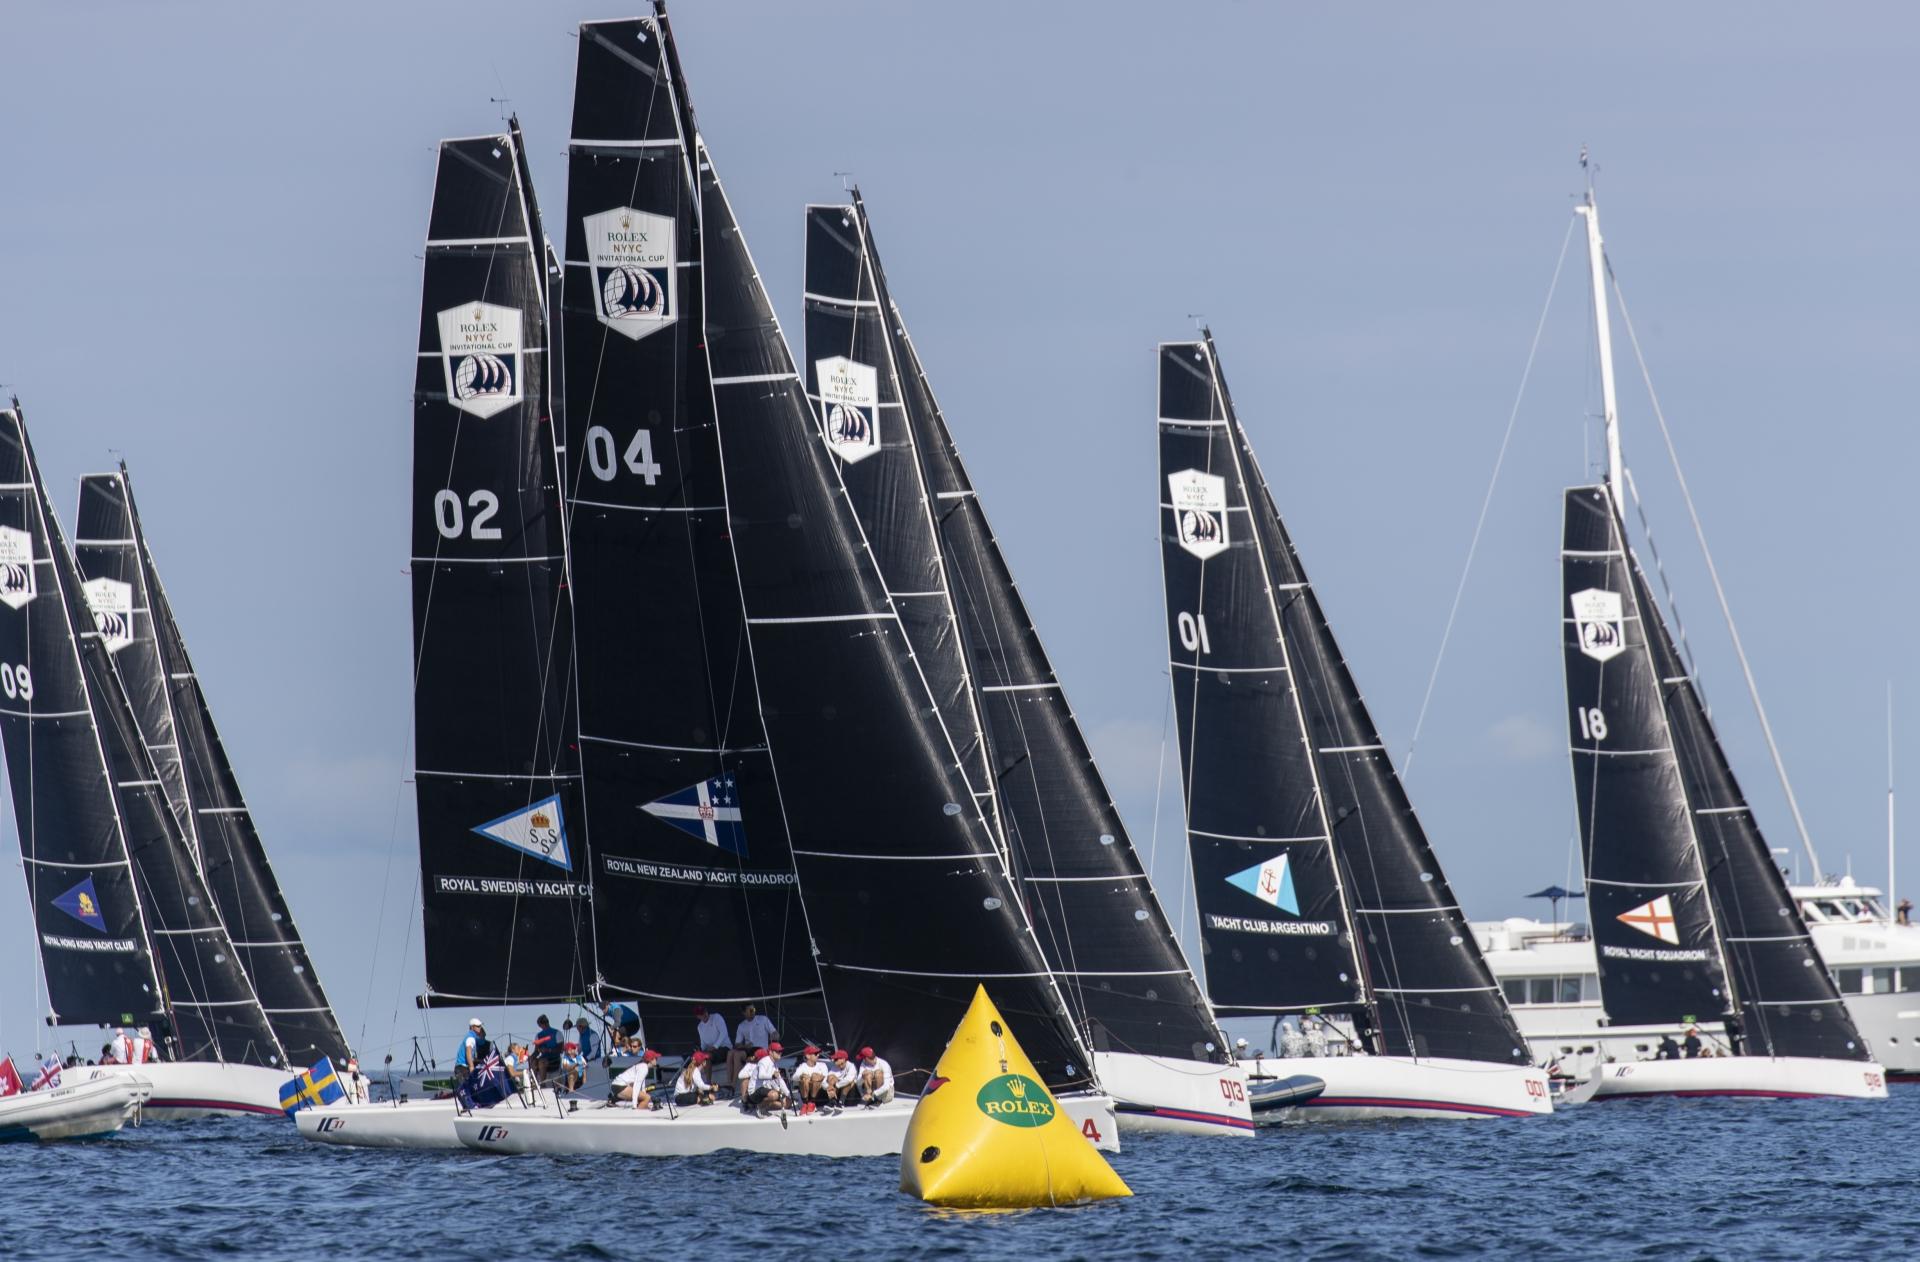 Rolex NYYC Invitational Cup, in regata anche il Team YCCS - NEWS - Yacht Club Costa Smeralda